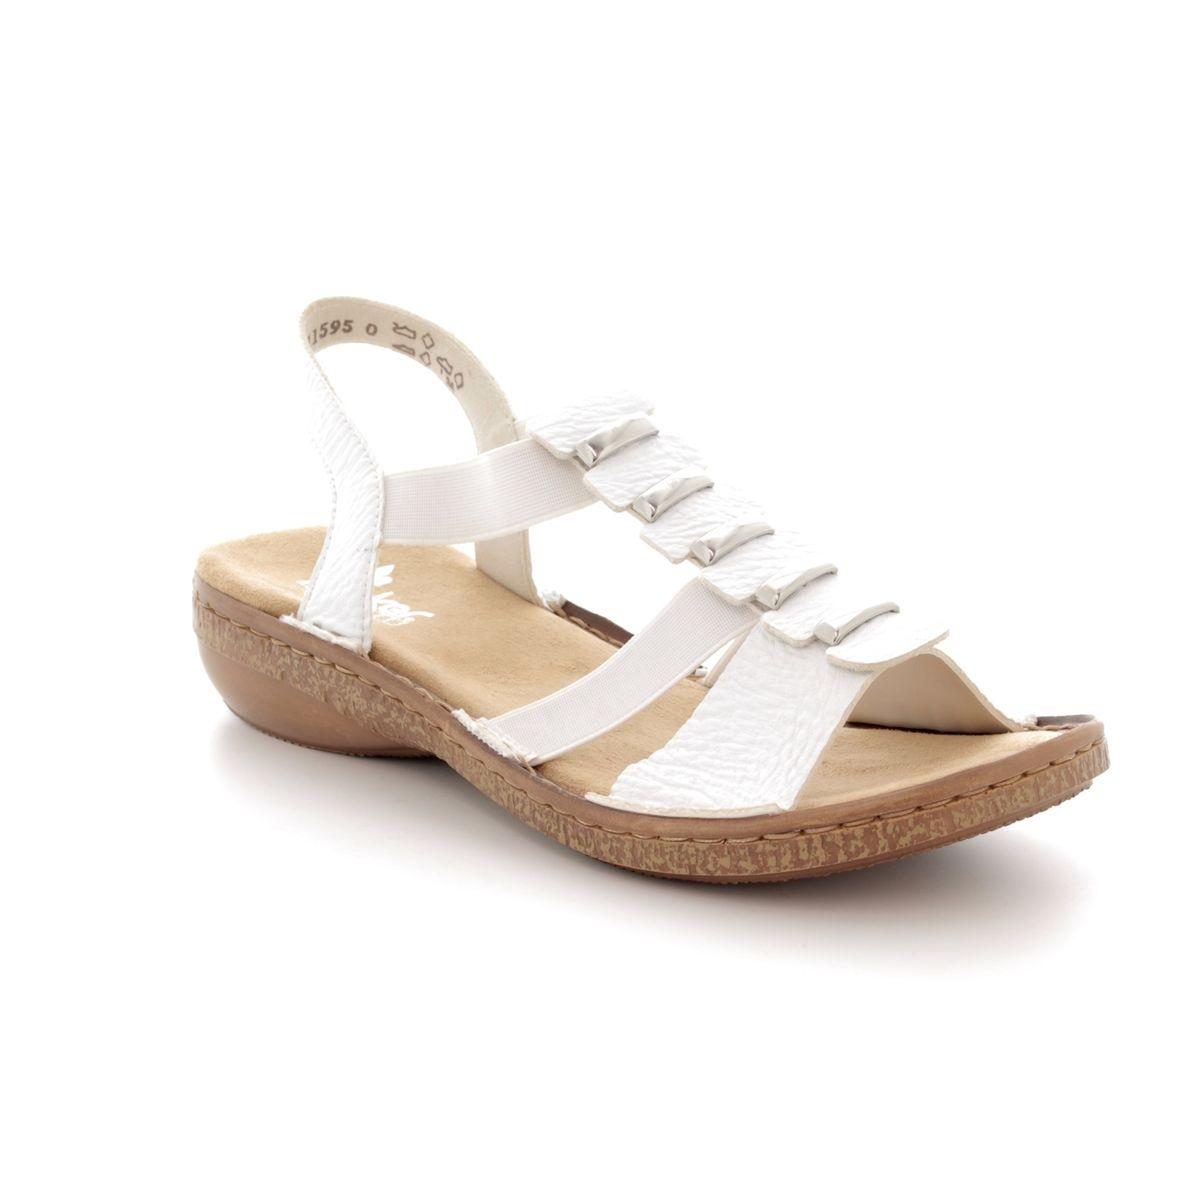 2ec2ff9bbacf Rieker Sandals - White - 62850-80 REGING